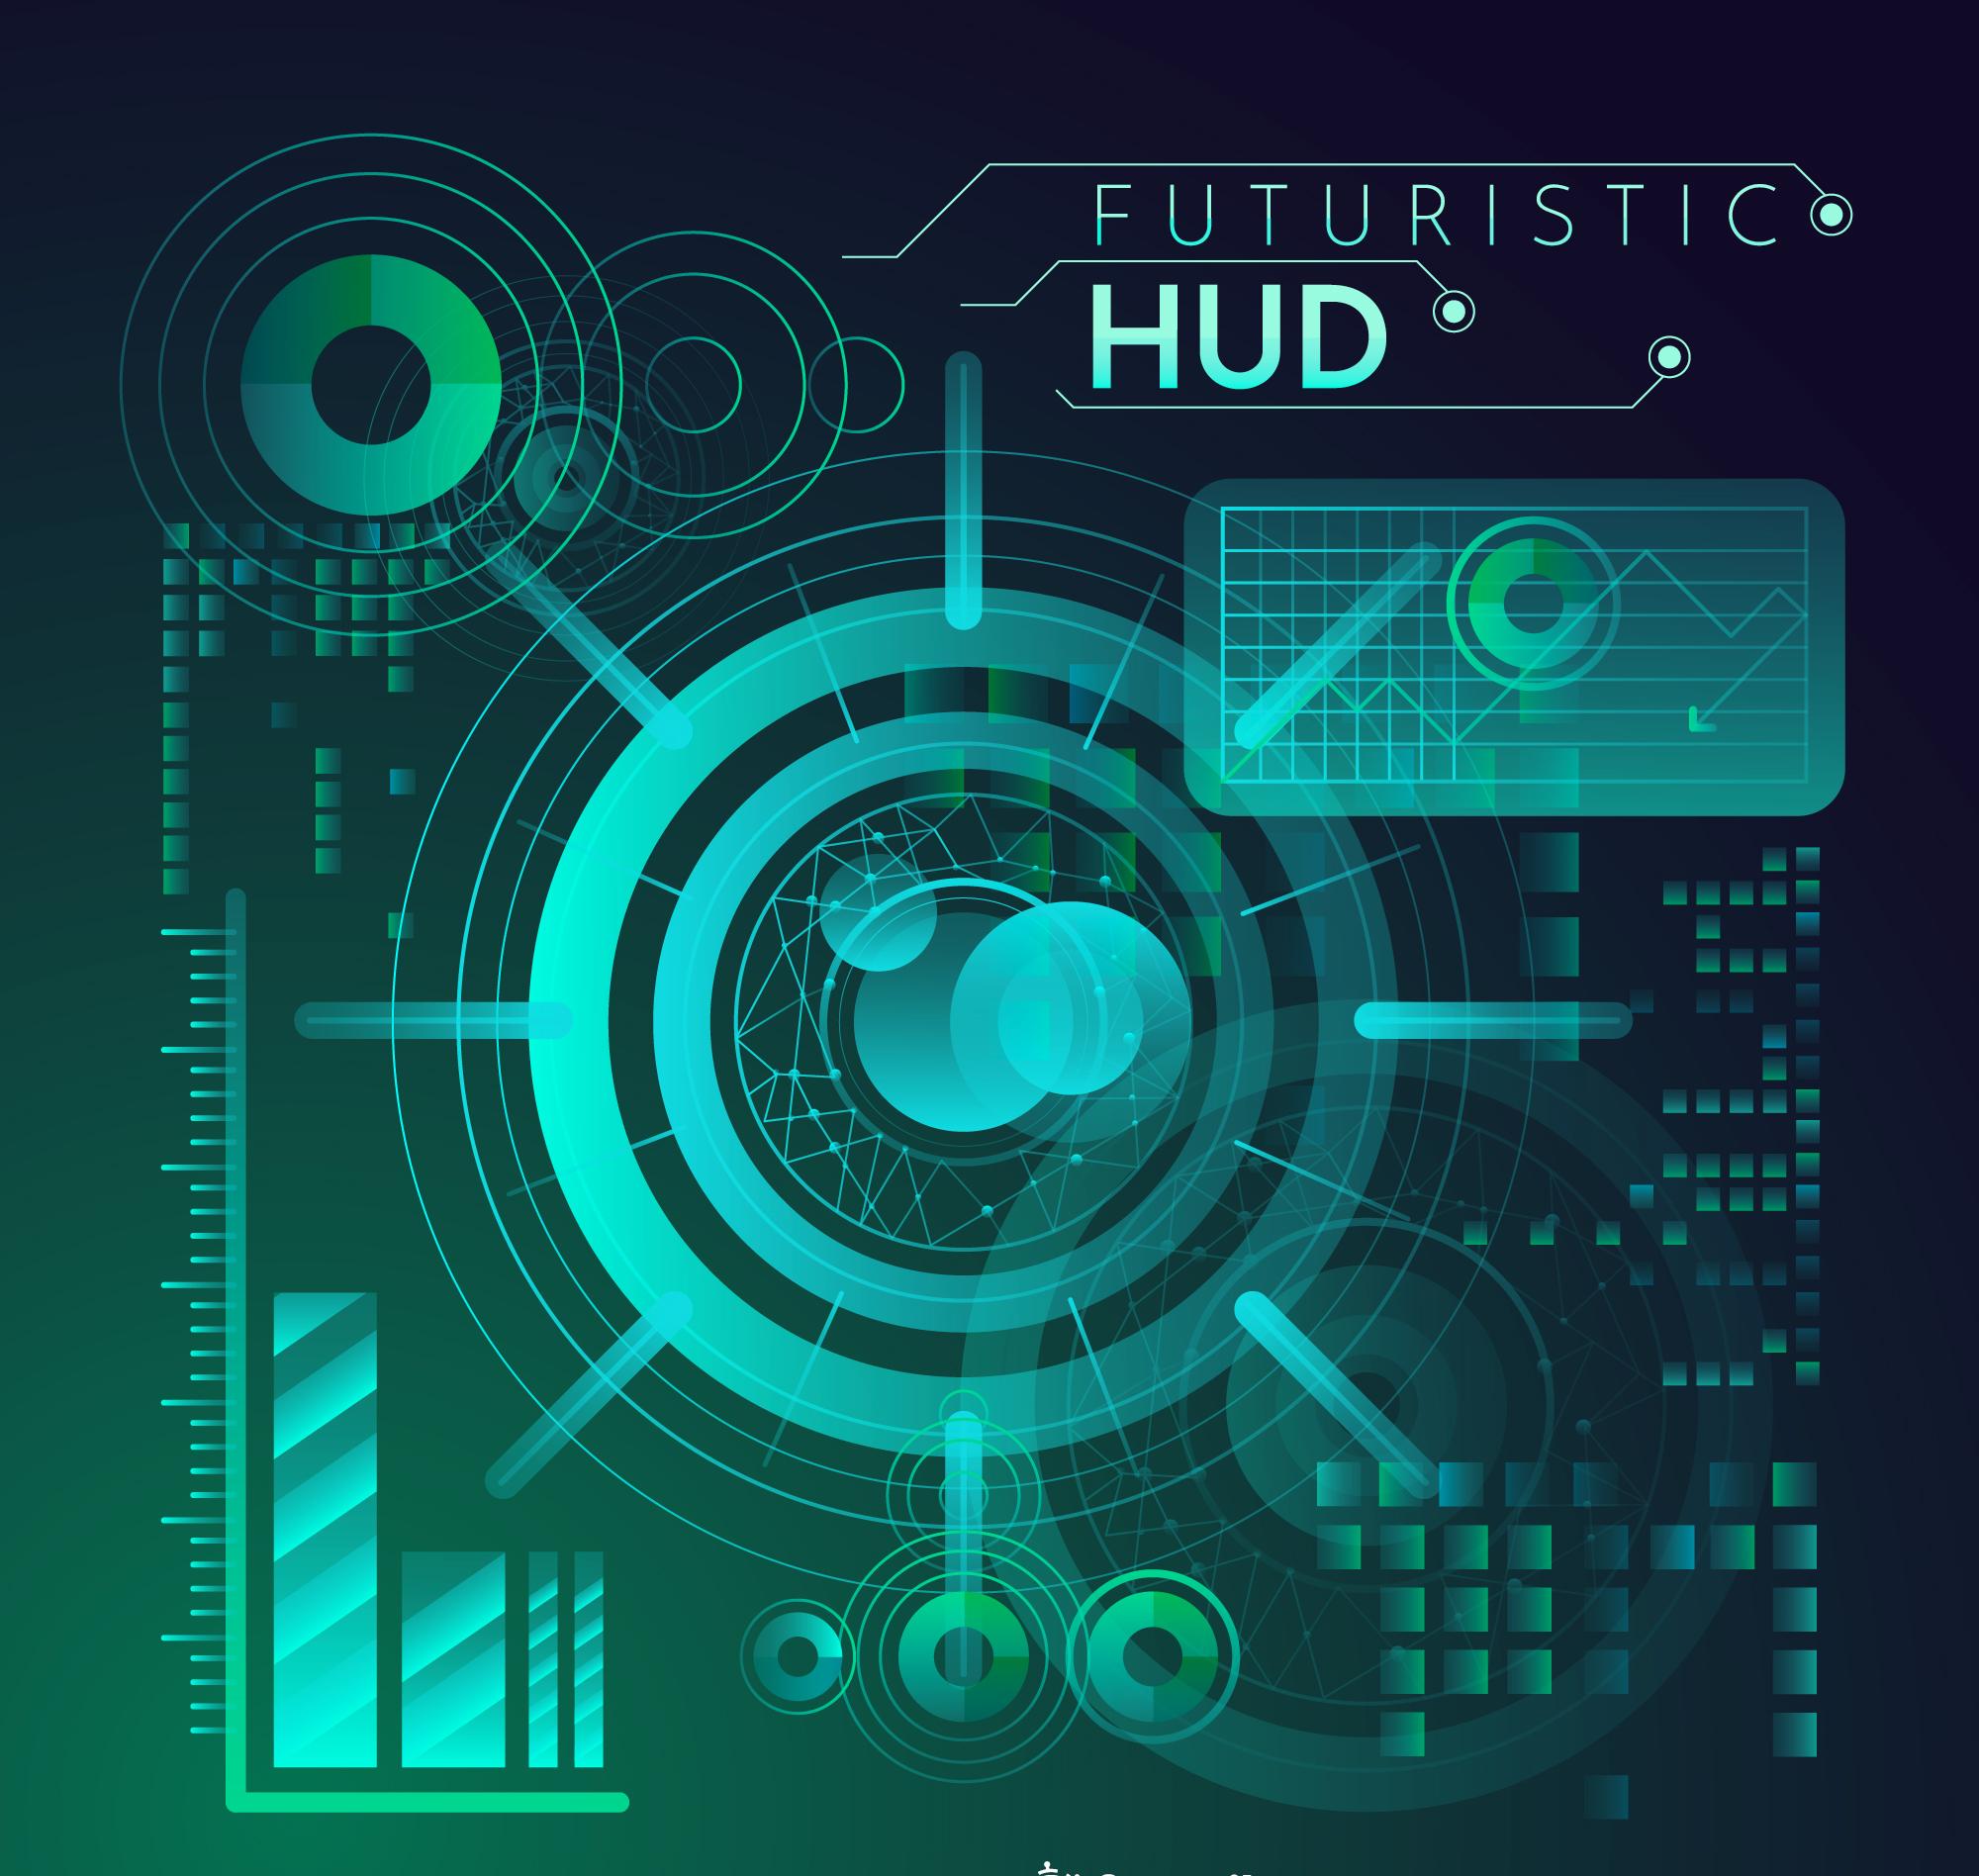 New 100 Futuristic Png Image Futuristic Interface Graphic Card